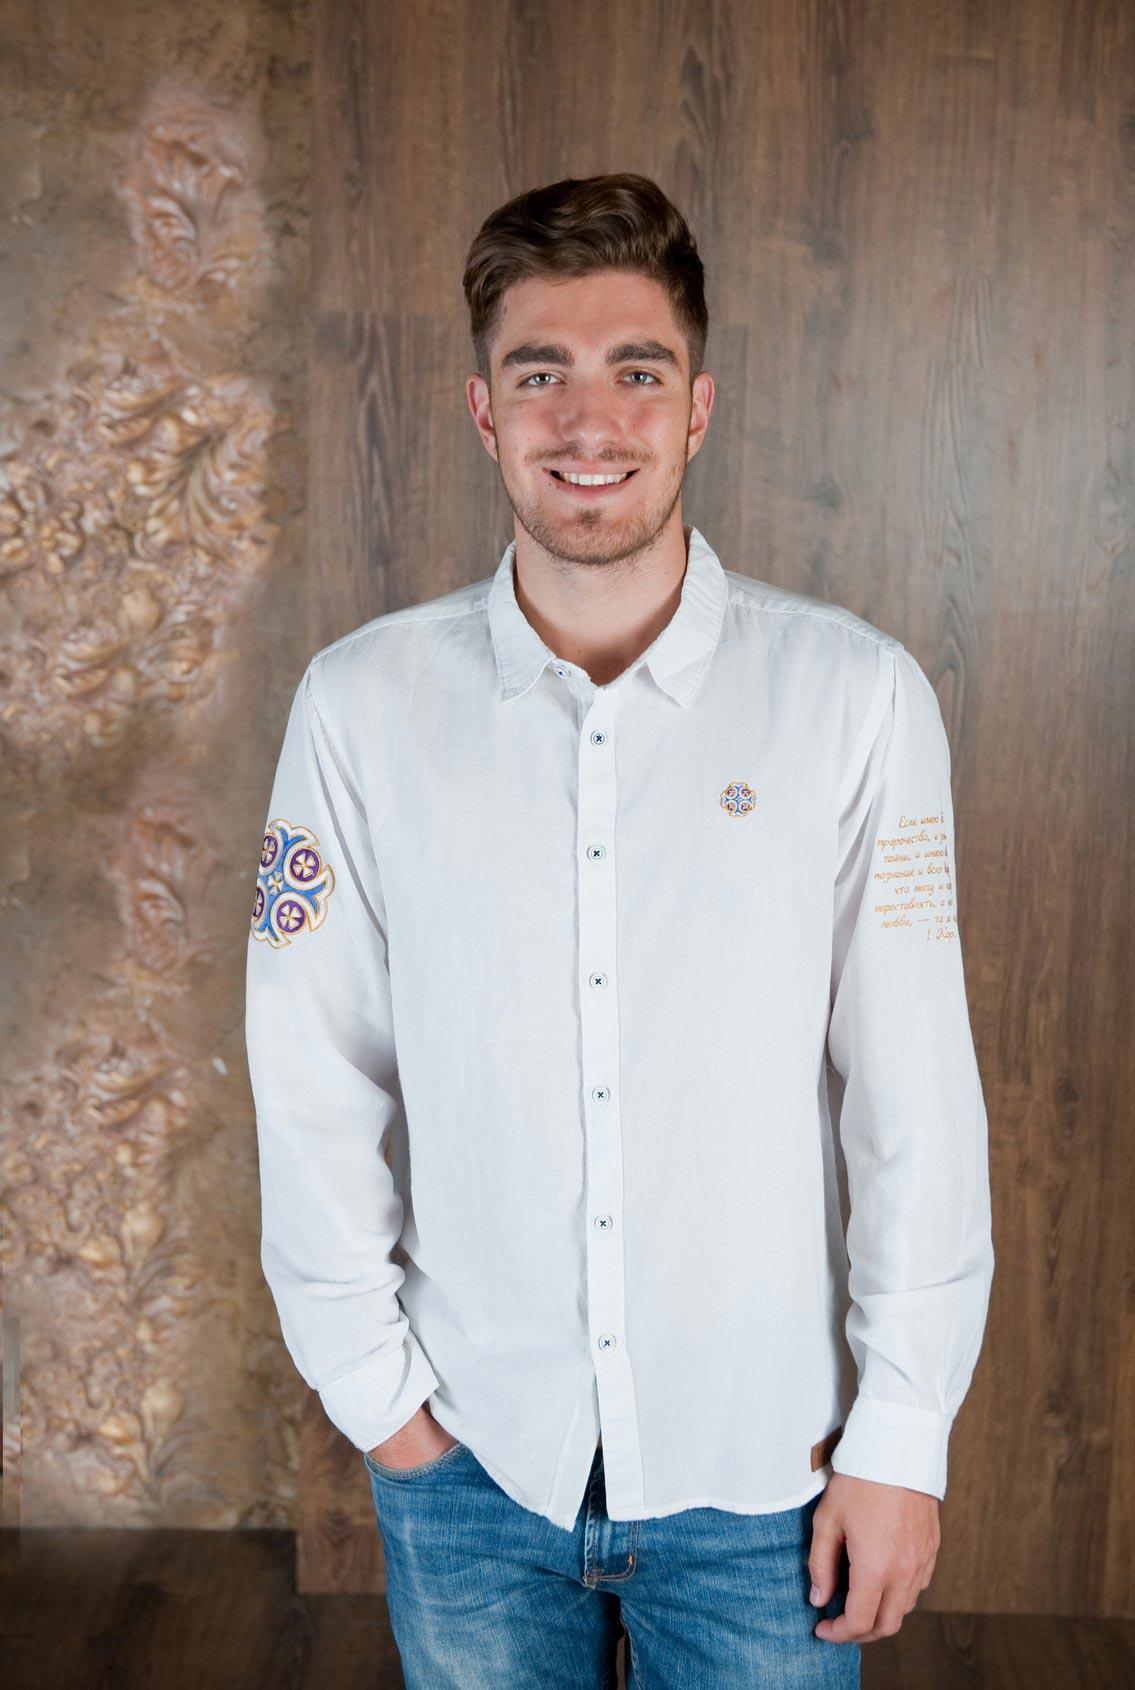 белая рубашка с синим крестом, white shirt with a blue cross